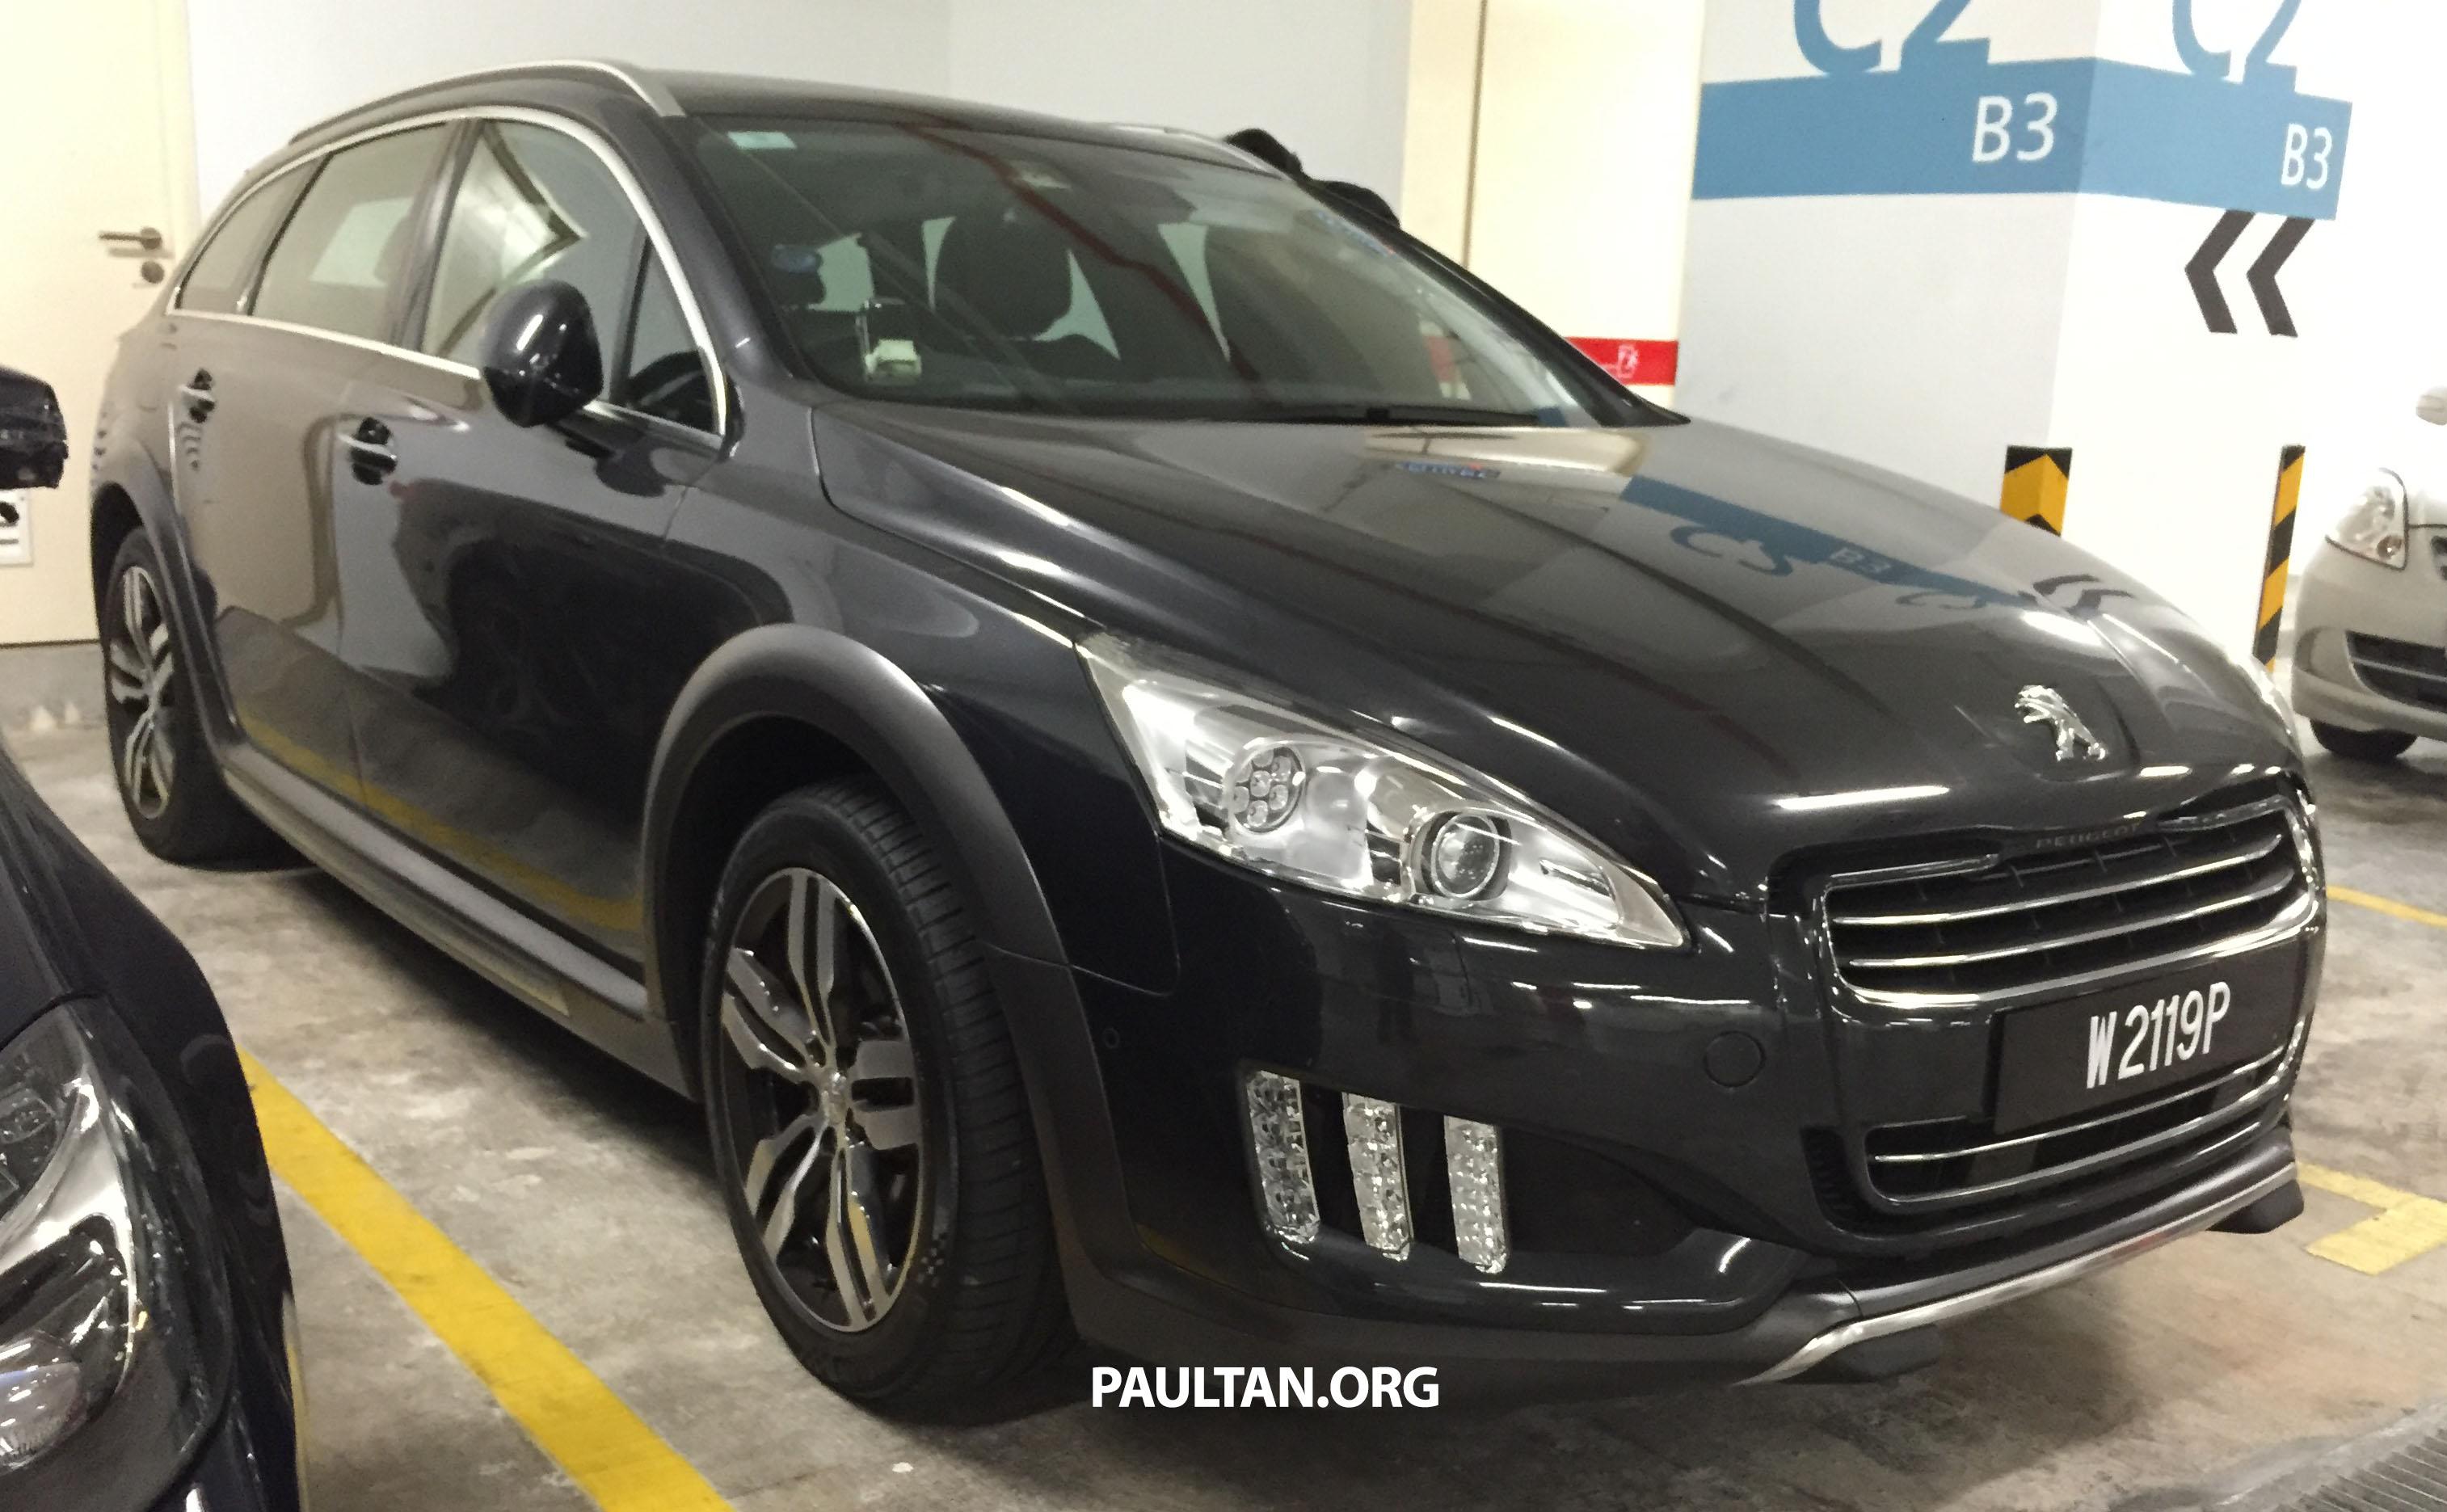 spied: peugeot 508 rxh hybrid4 in basement parking